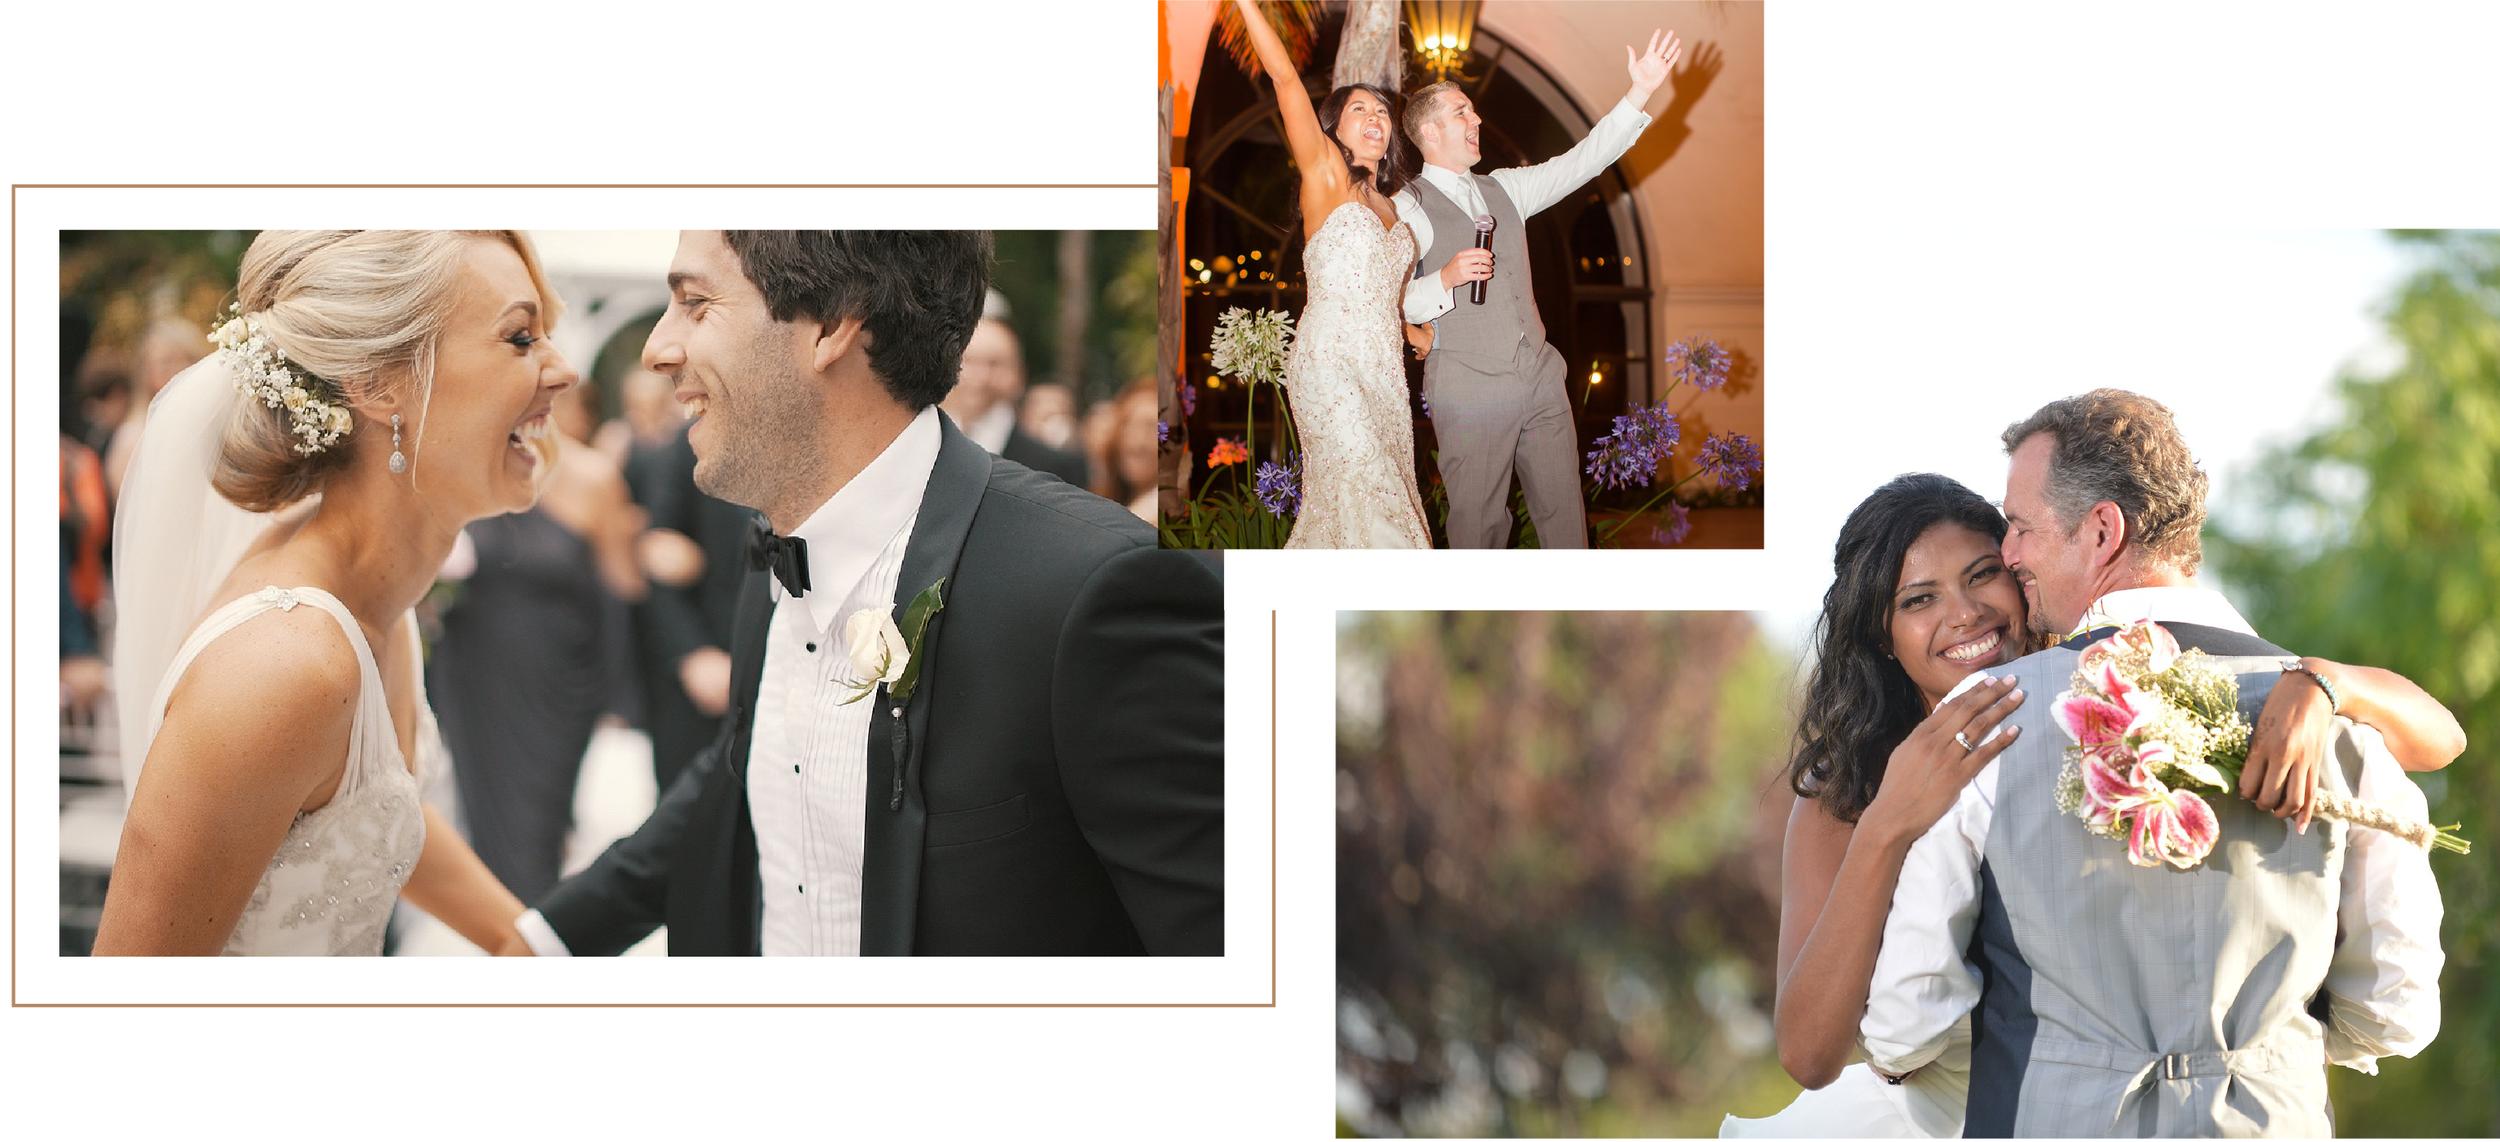 Santa Barbara Wedding DJs: Top Wedding and Event DJs and Emcees